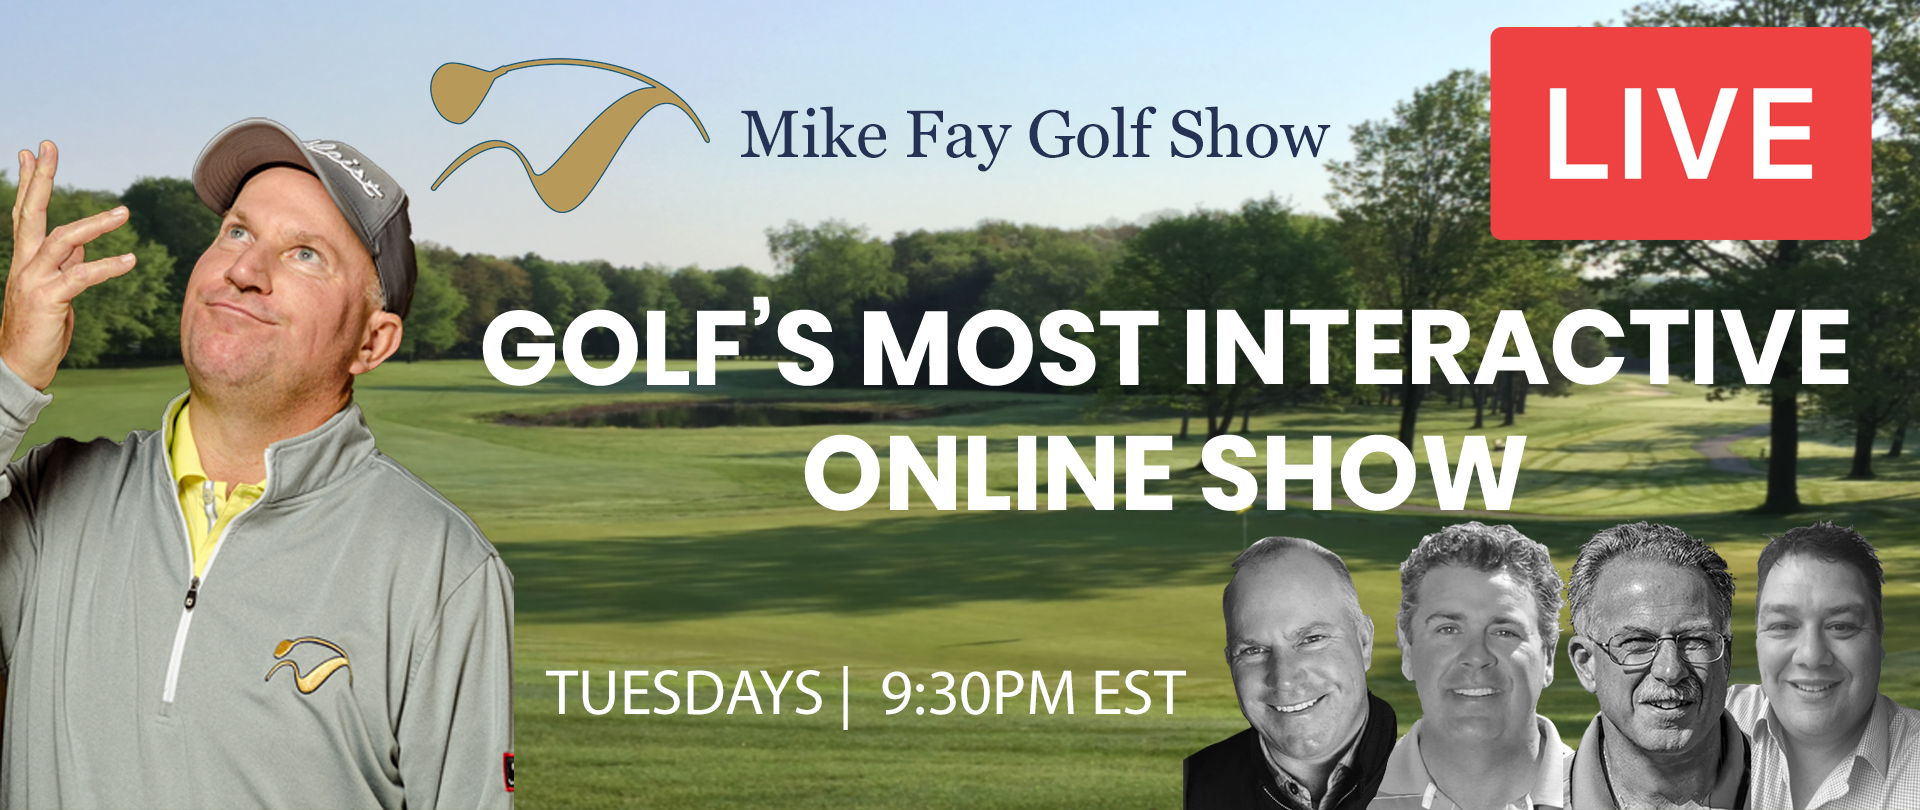 MFG Show Golf Most Interactive Online Show